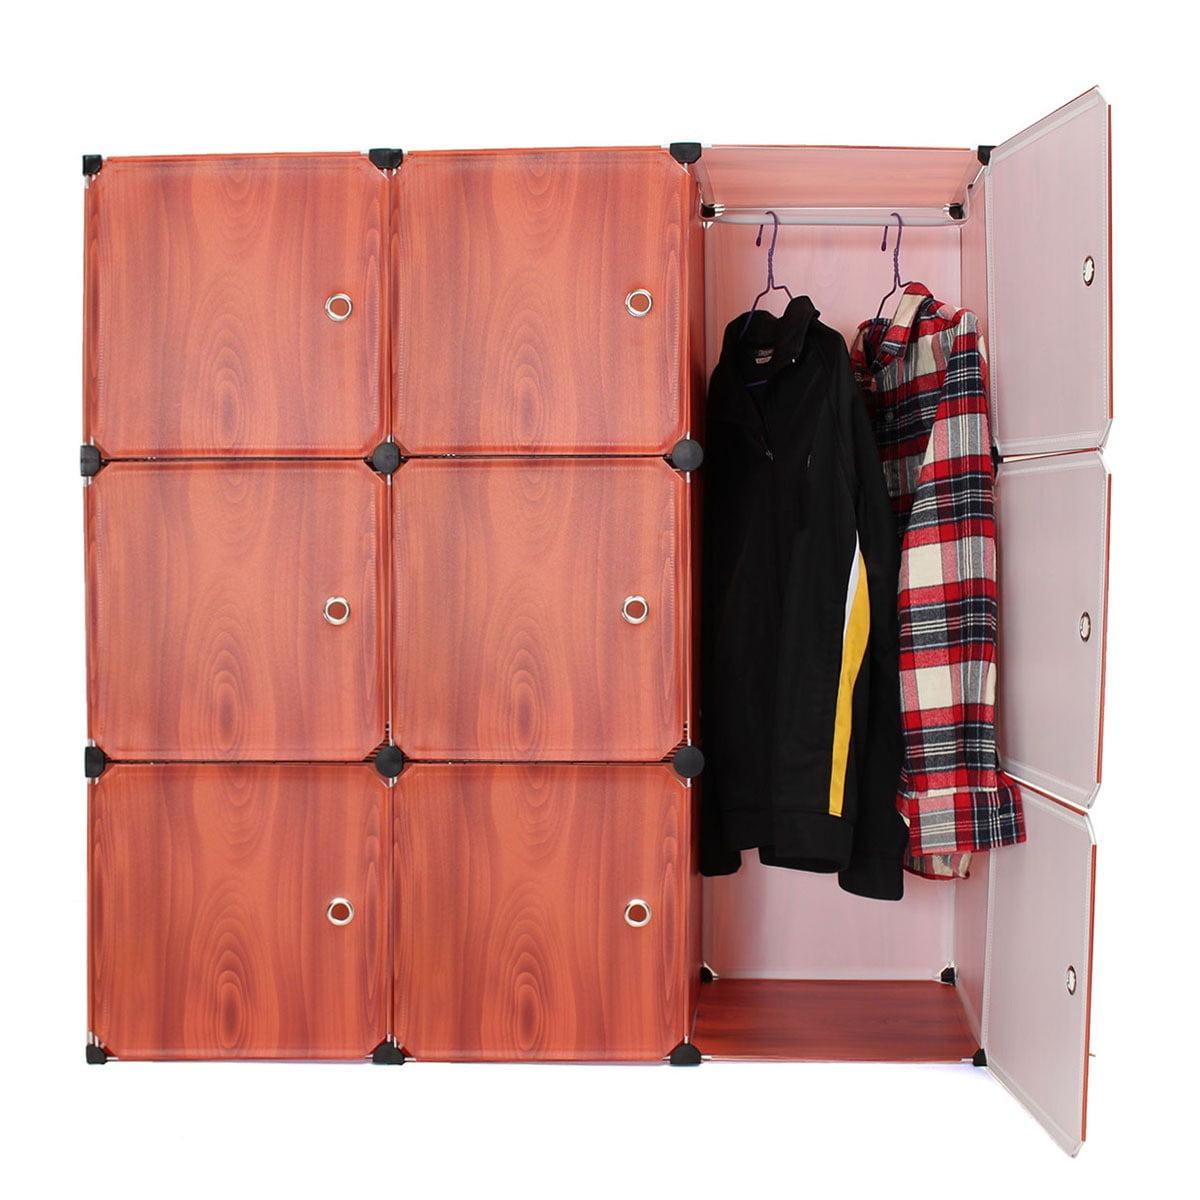 9 Interlocking Cube Storage Wardrobe Shelves Closet Shoe Rack Book Shelf Cabinet DIY